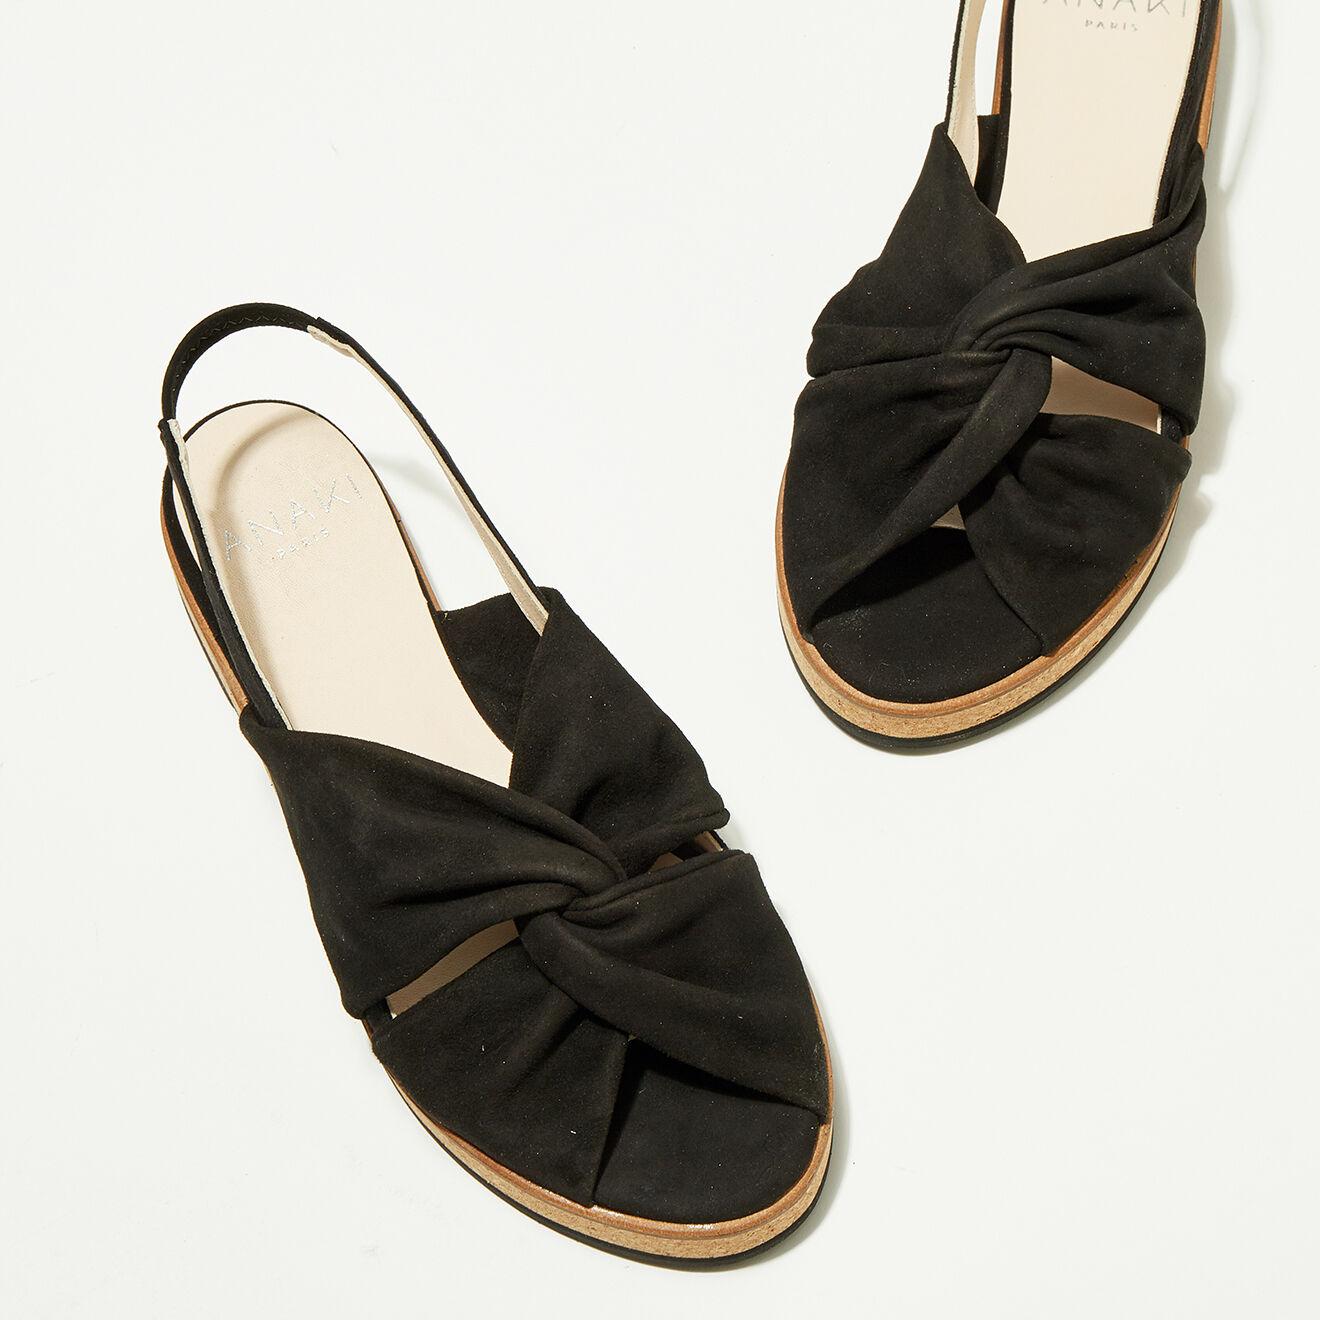 Sandales en Velours de Cuir Mismi noires - Anaki - Modalova